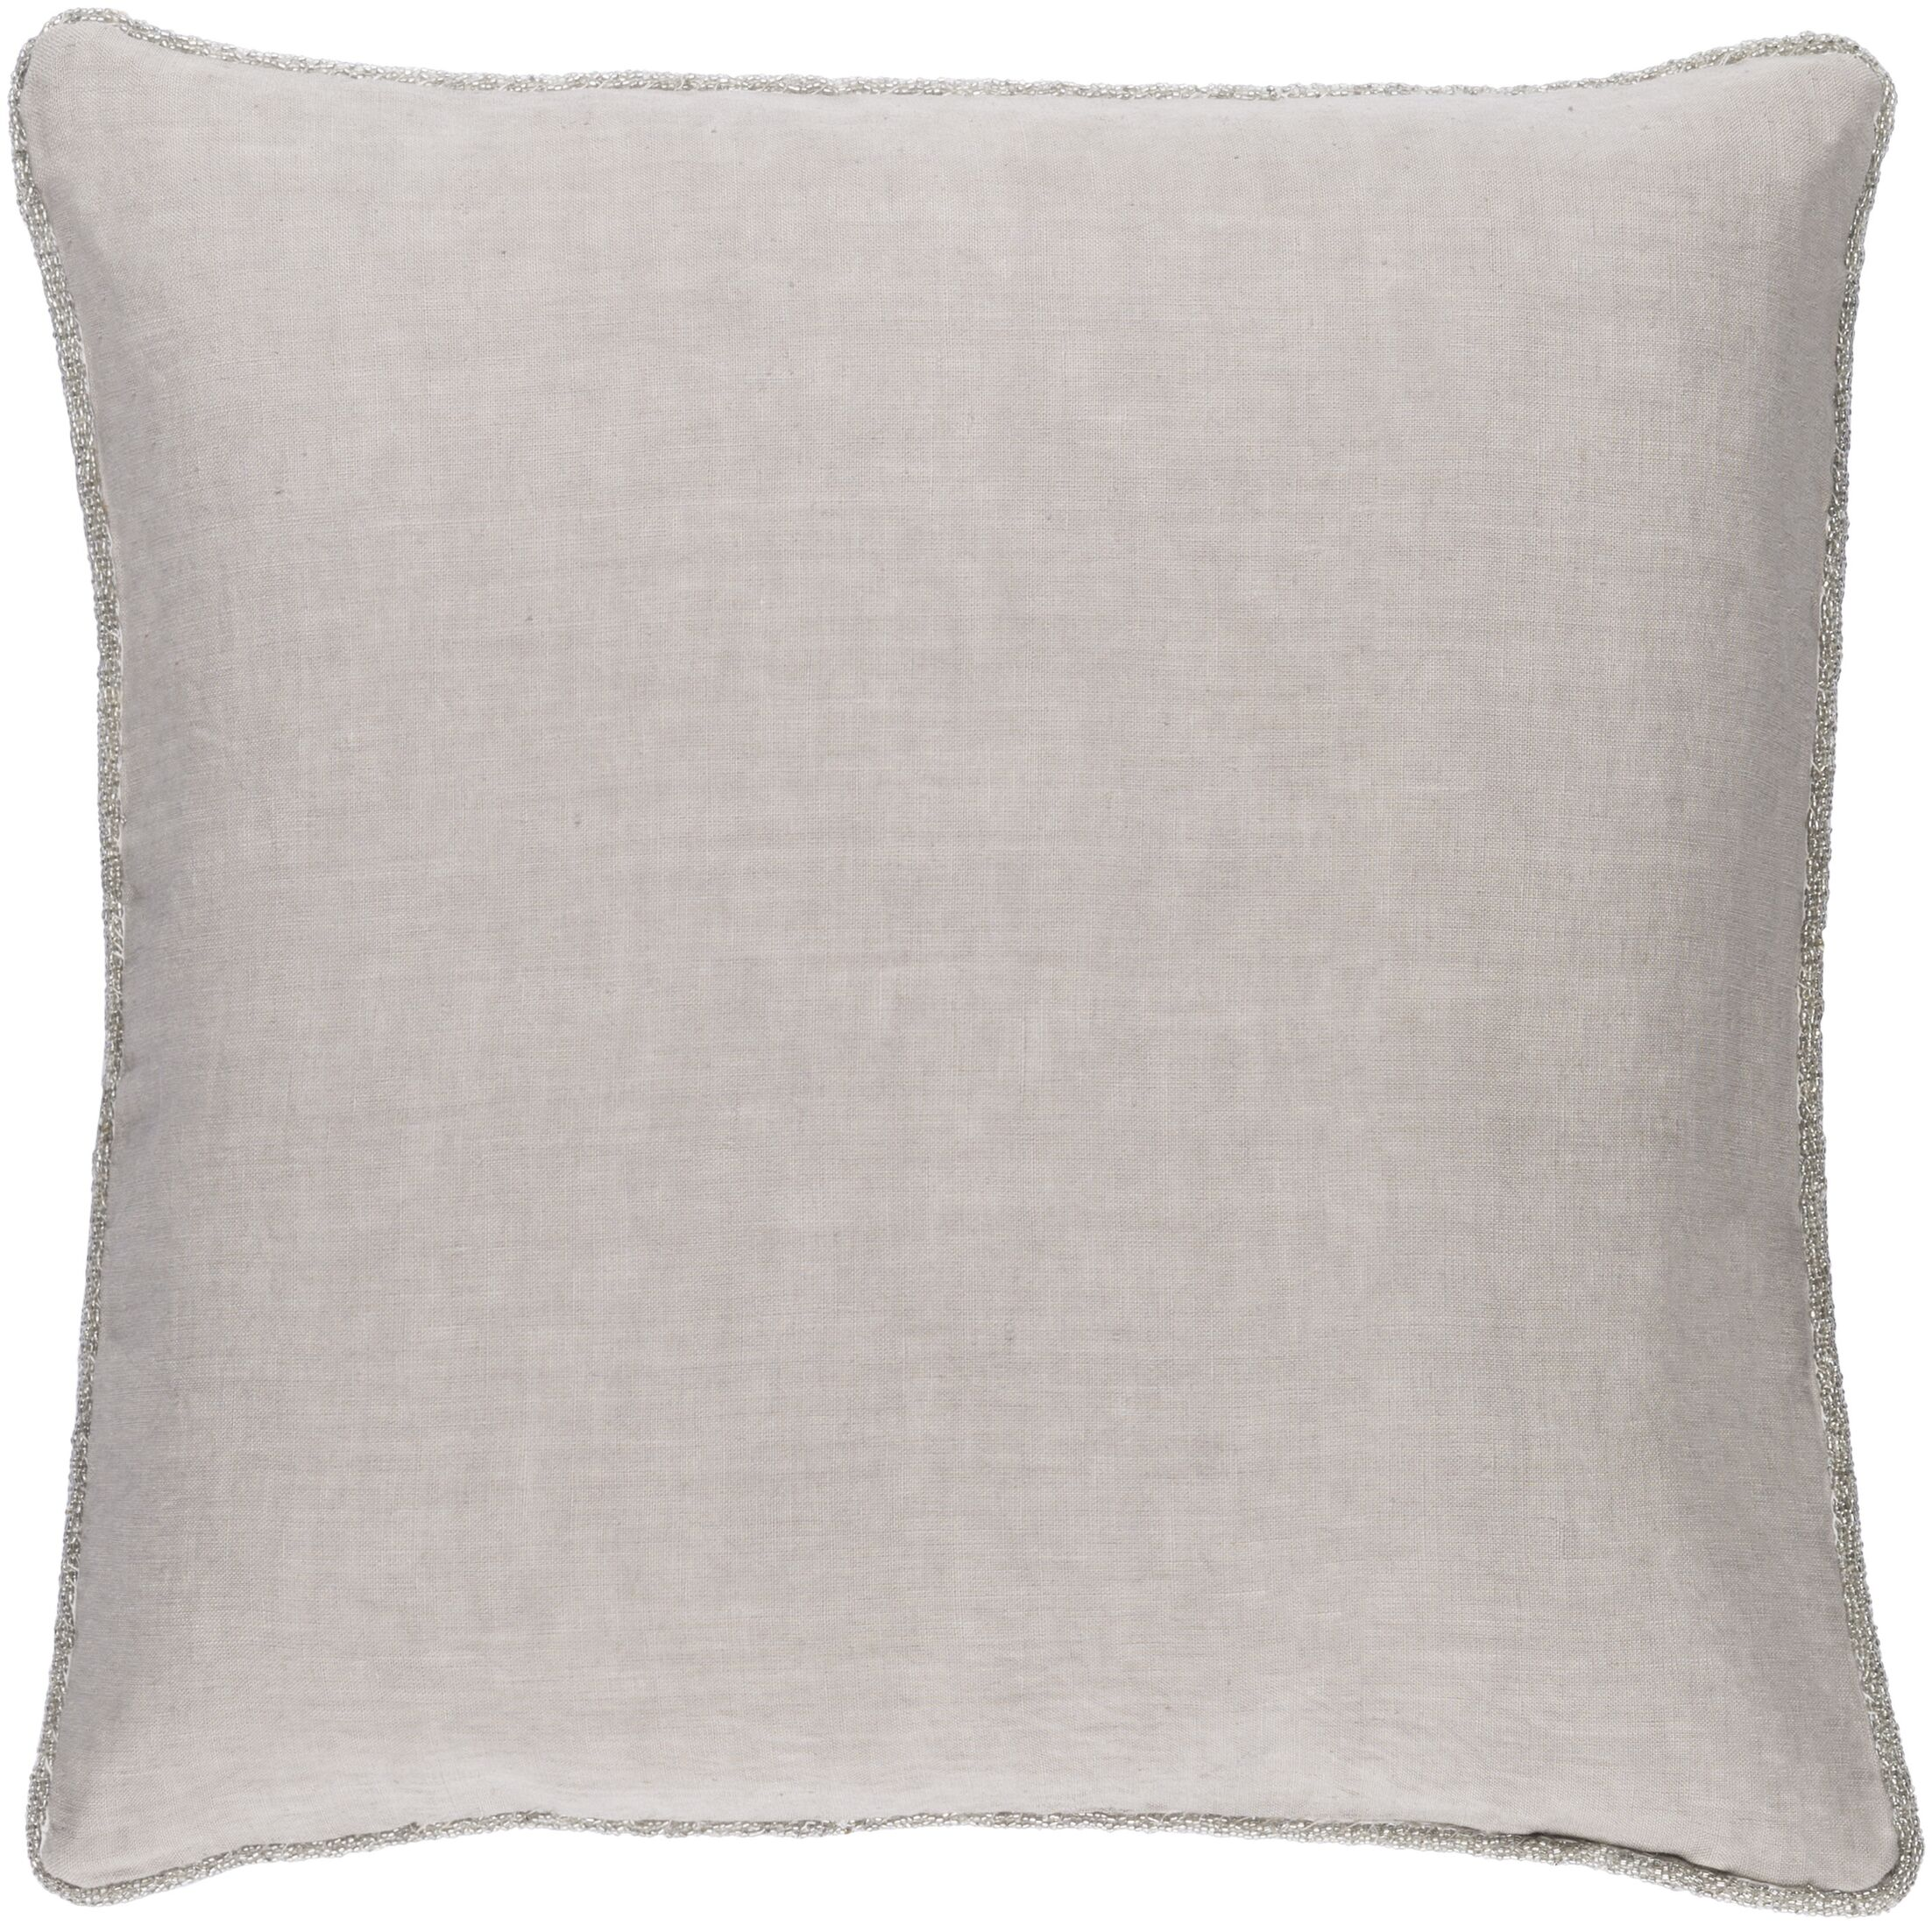 Sera Down Throw Pillow Color: Light Gray, Size: 20